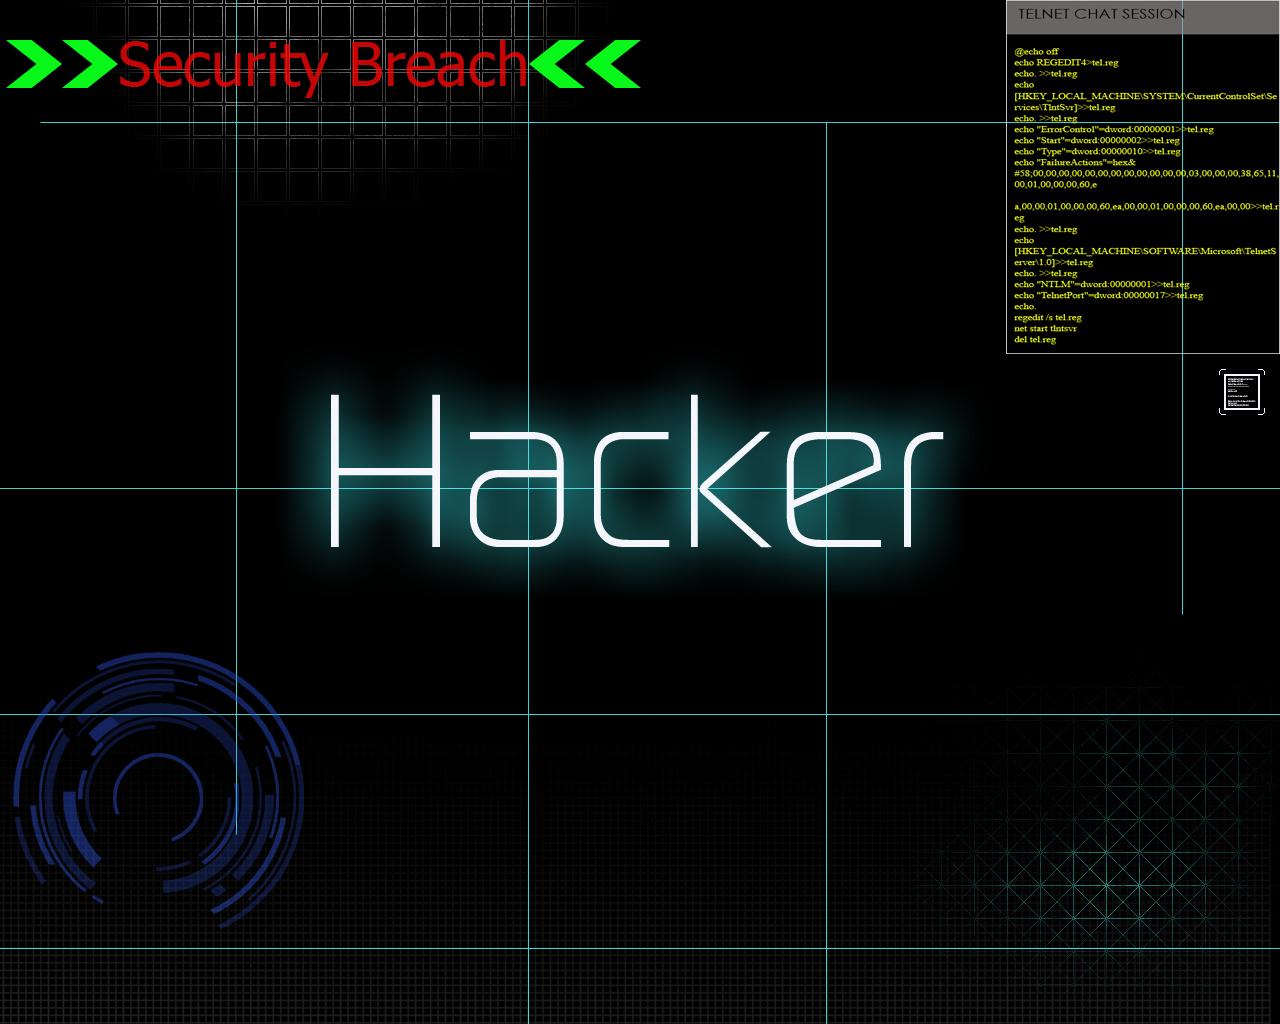 http://2.bp.blogspot.com/_EZtSTdMQb40/TSWSNa5vaXI/AAAAAAAAADI/mCOgOayPvDg/s1600/Hacker_Wallpaper_1280x1024_by_Pengo1.jpg